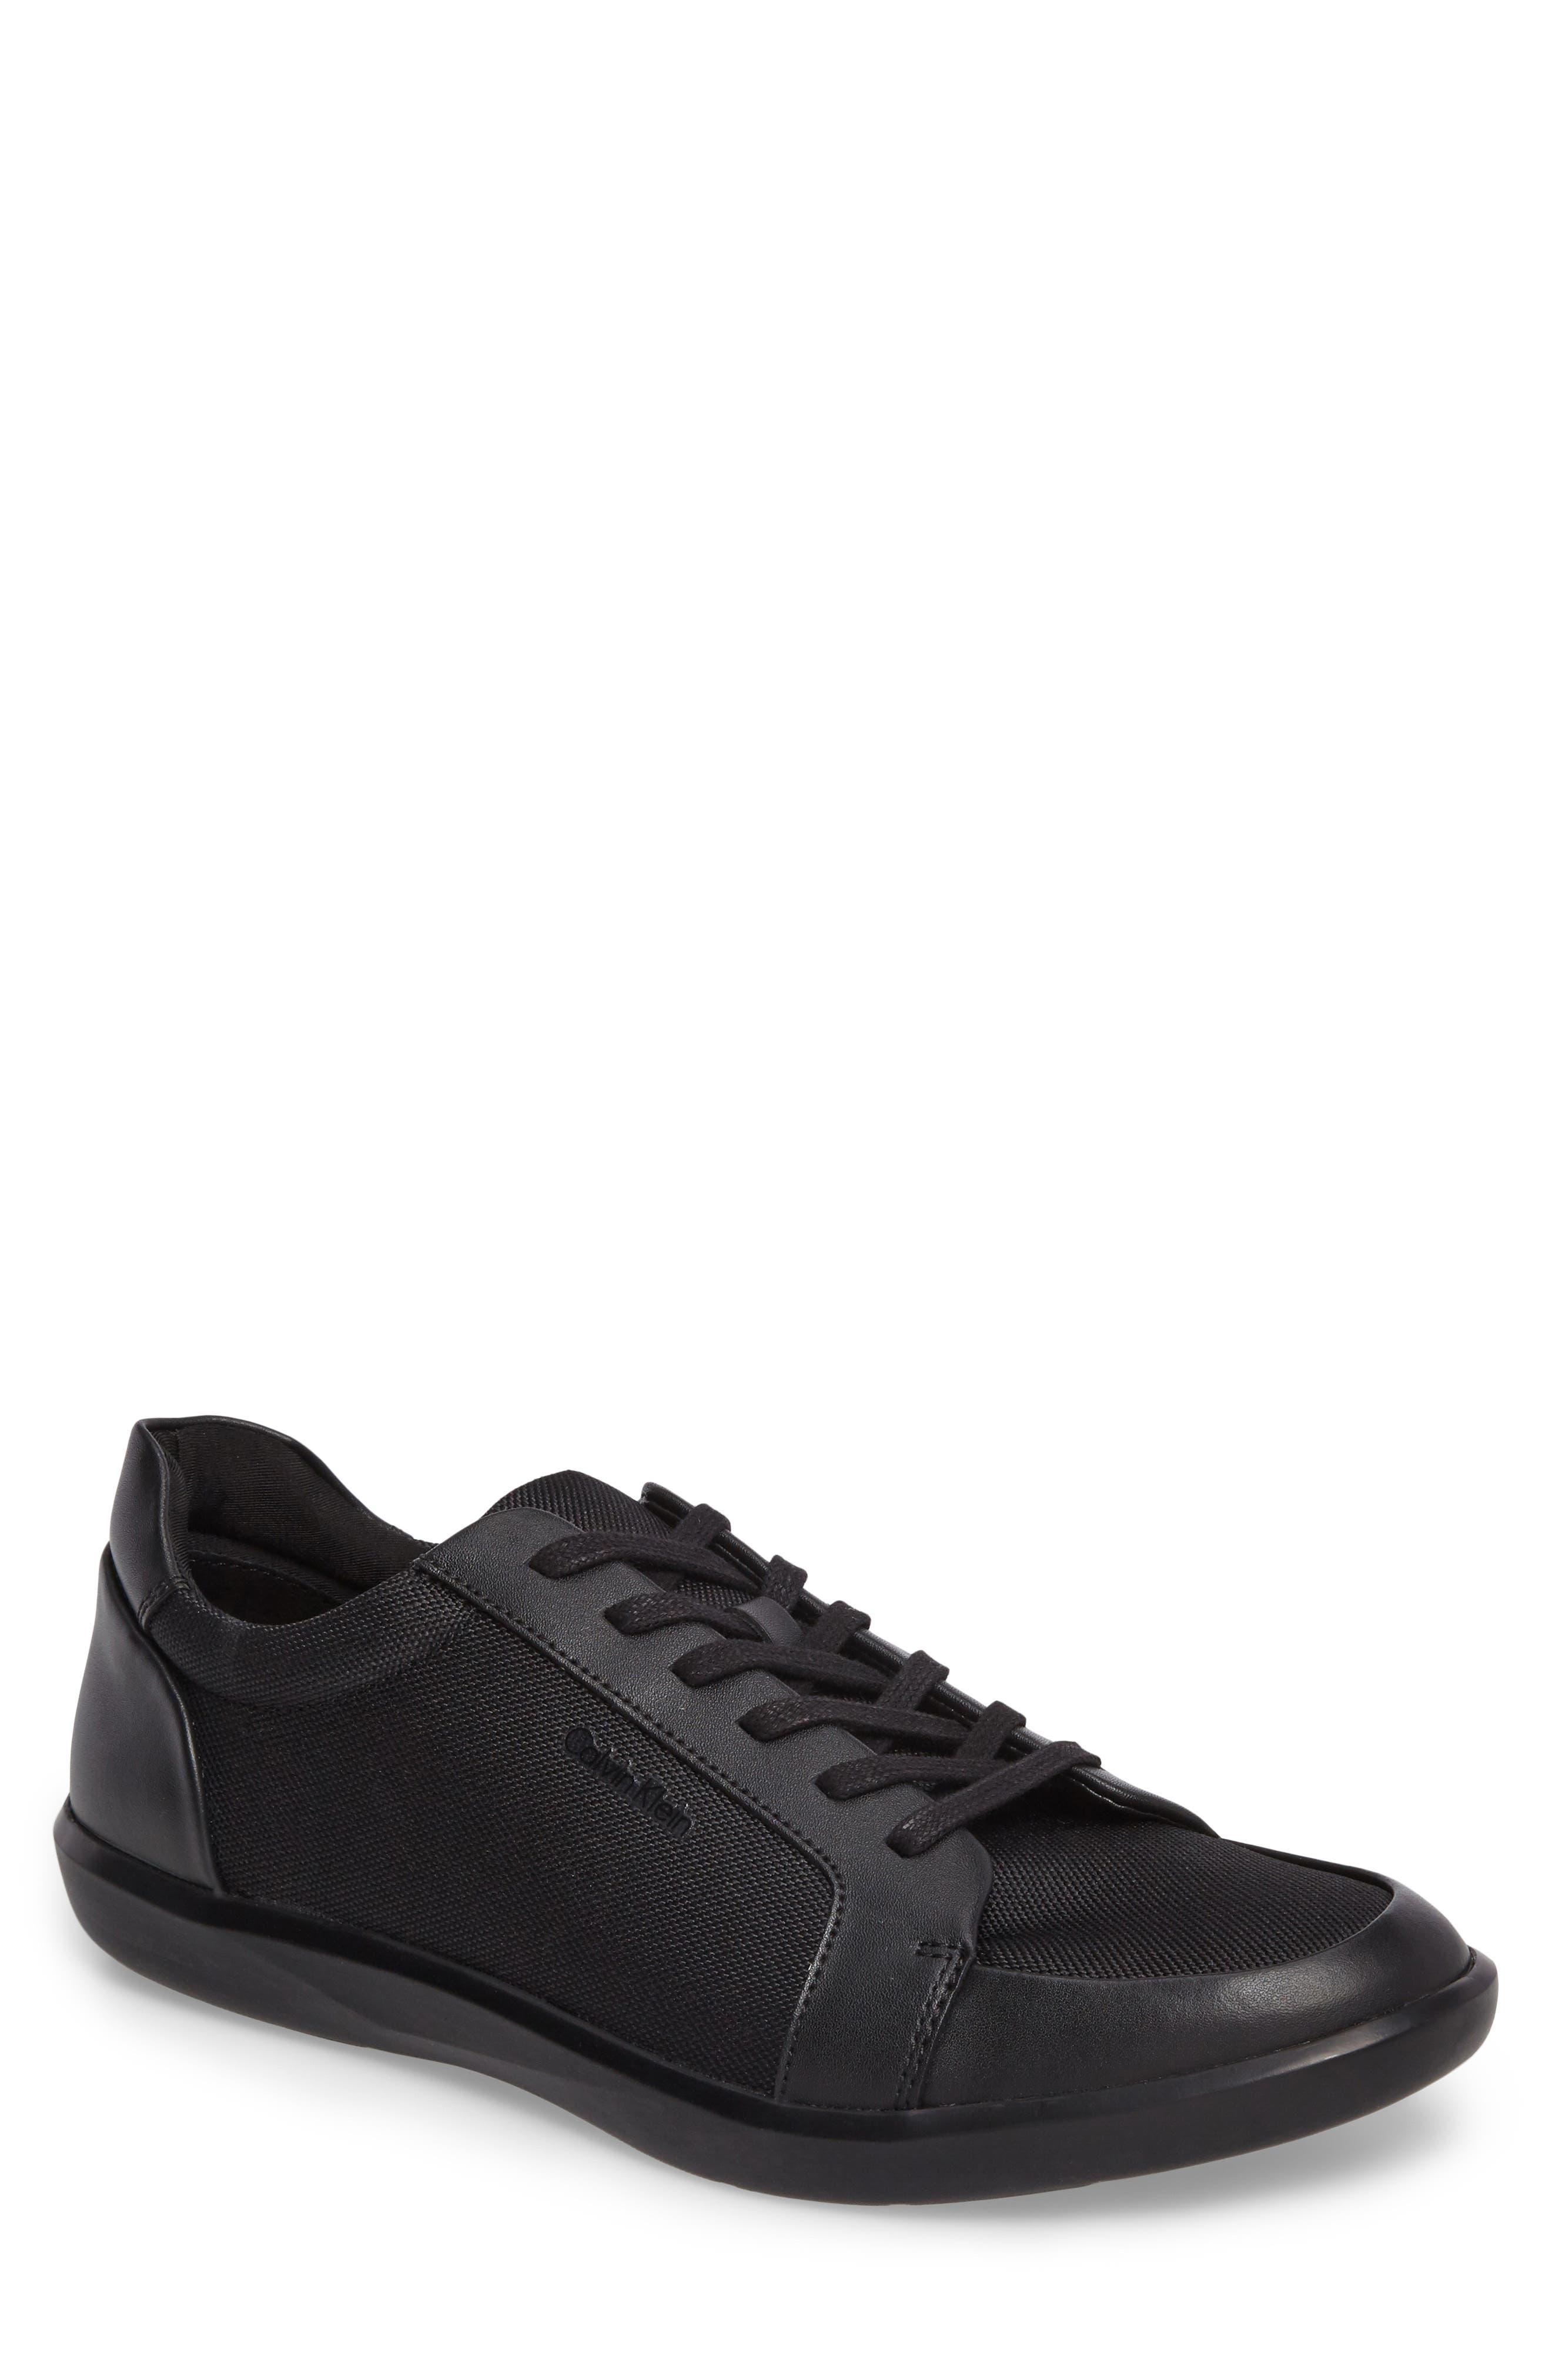 Alternate Image 1 Selected - Calvin Klein Macabee Sneaker (Men)